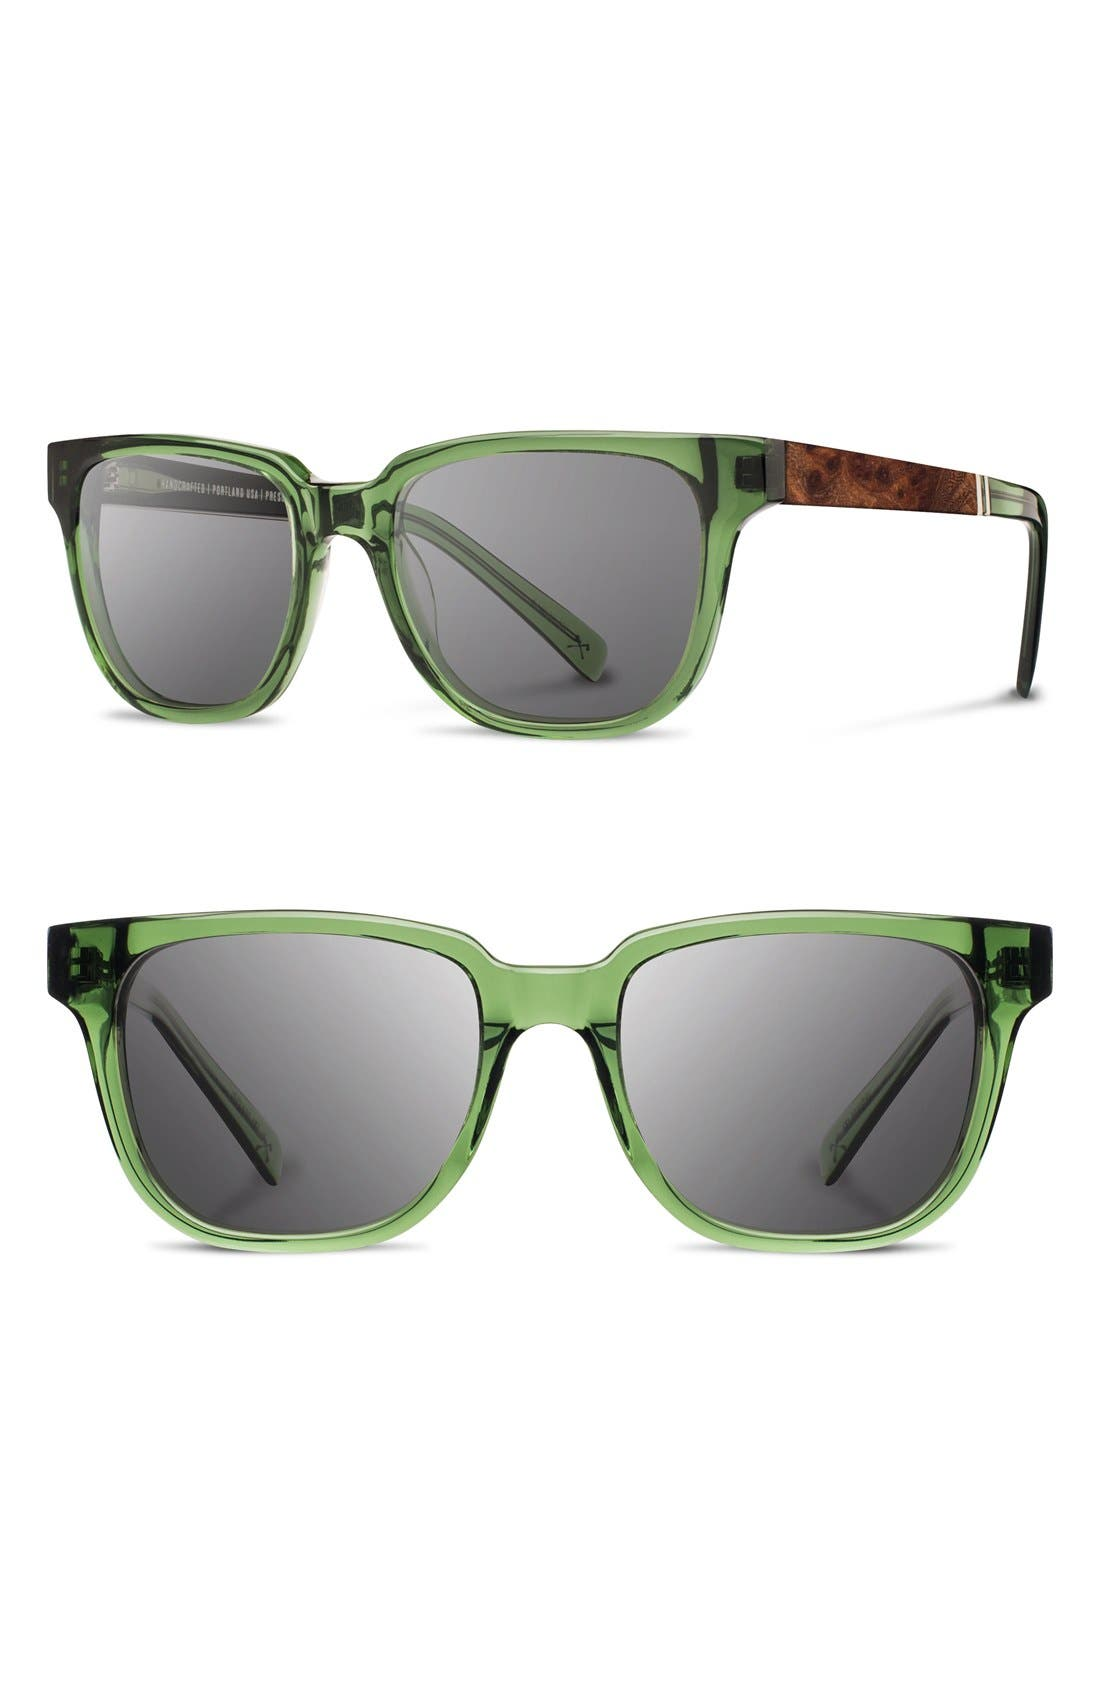 Main Image - Shwood 'Prescott' 52mm Polarized Sunglasses